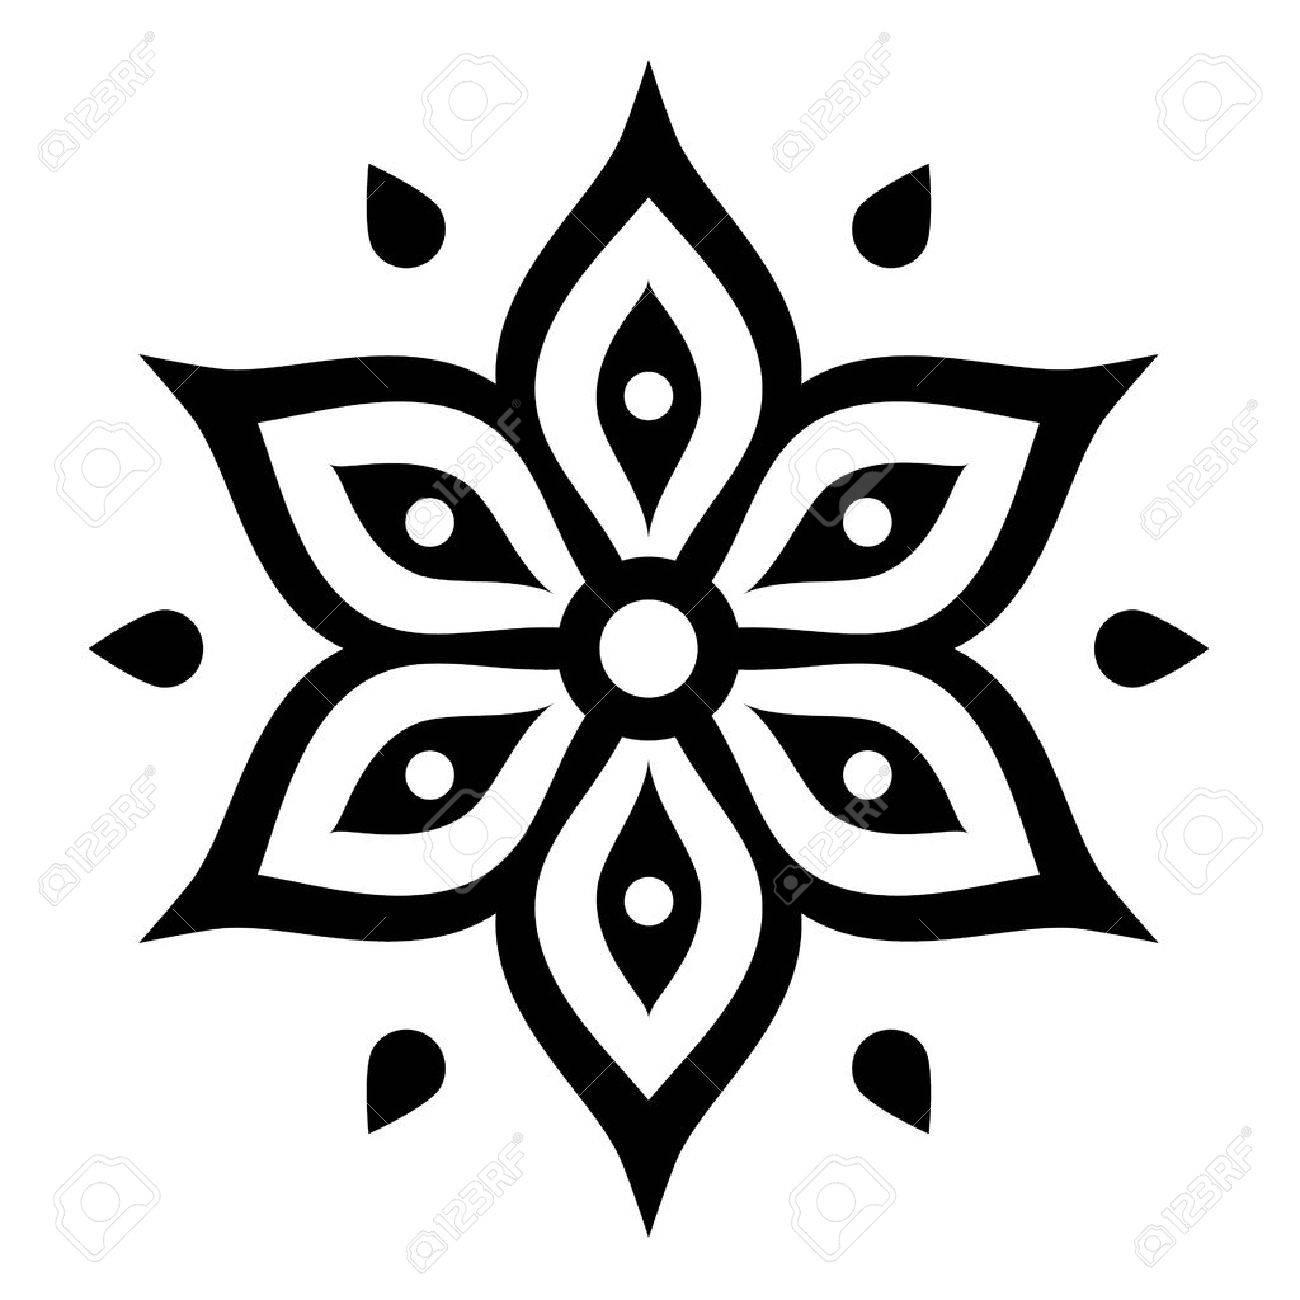 Boho Flower Design Inspired By Mehndi Indian Henna Tattoo Royalty